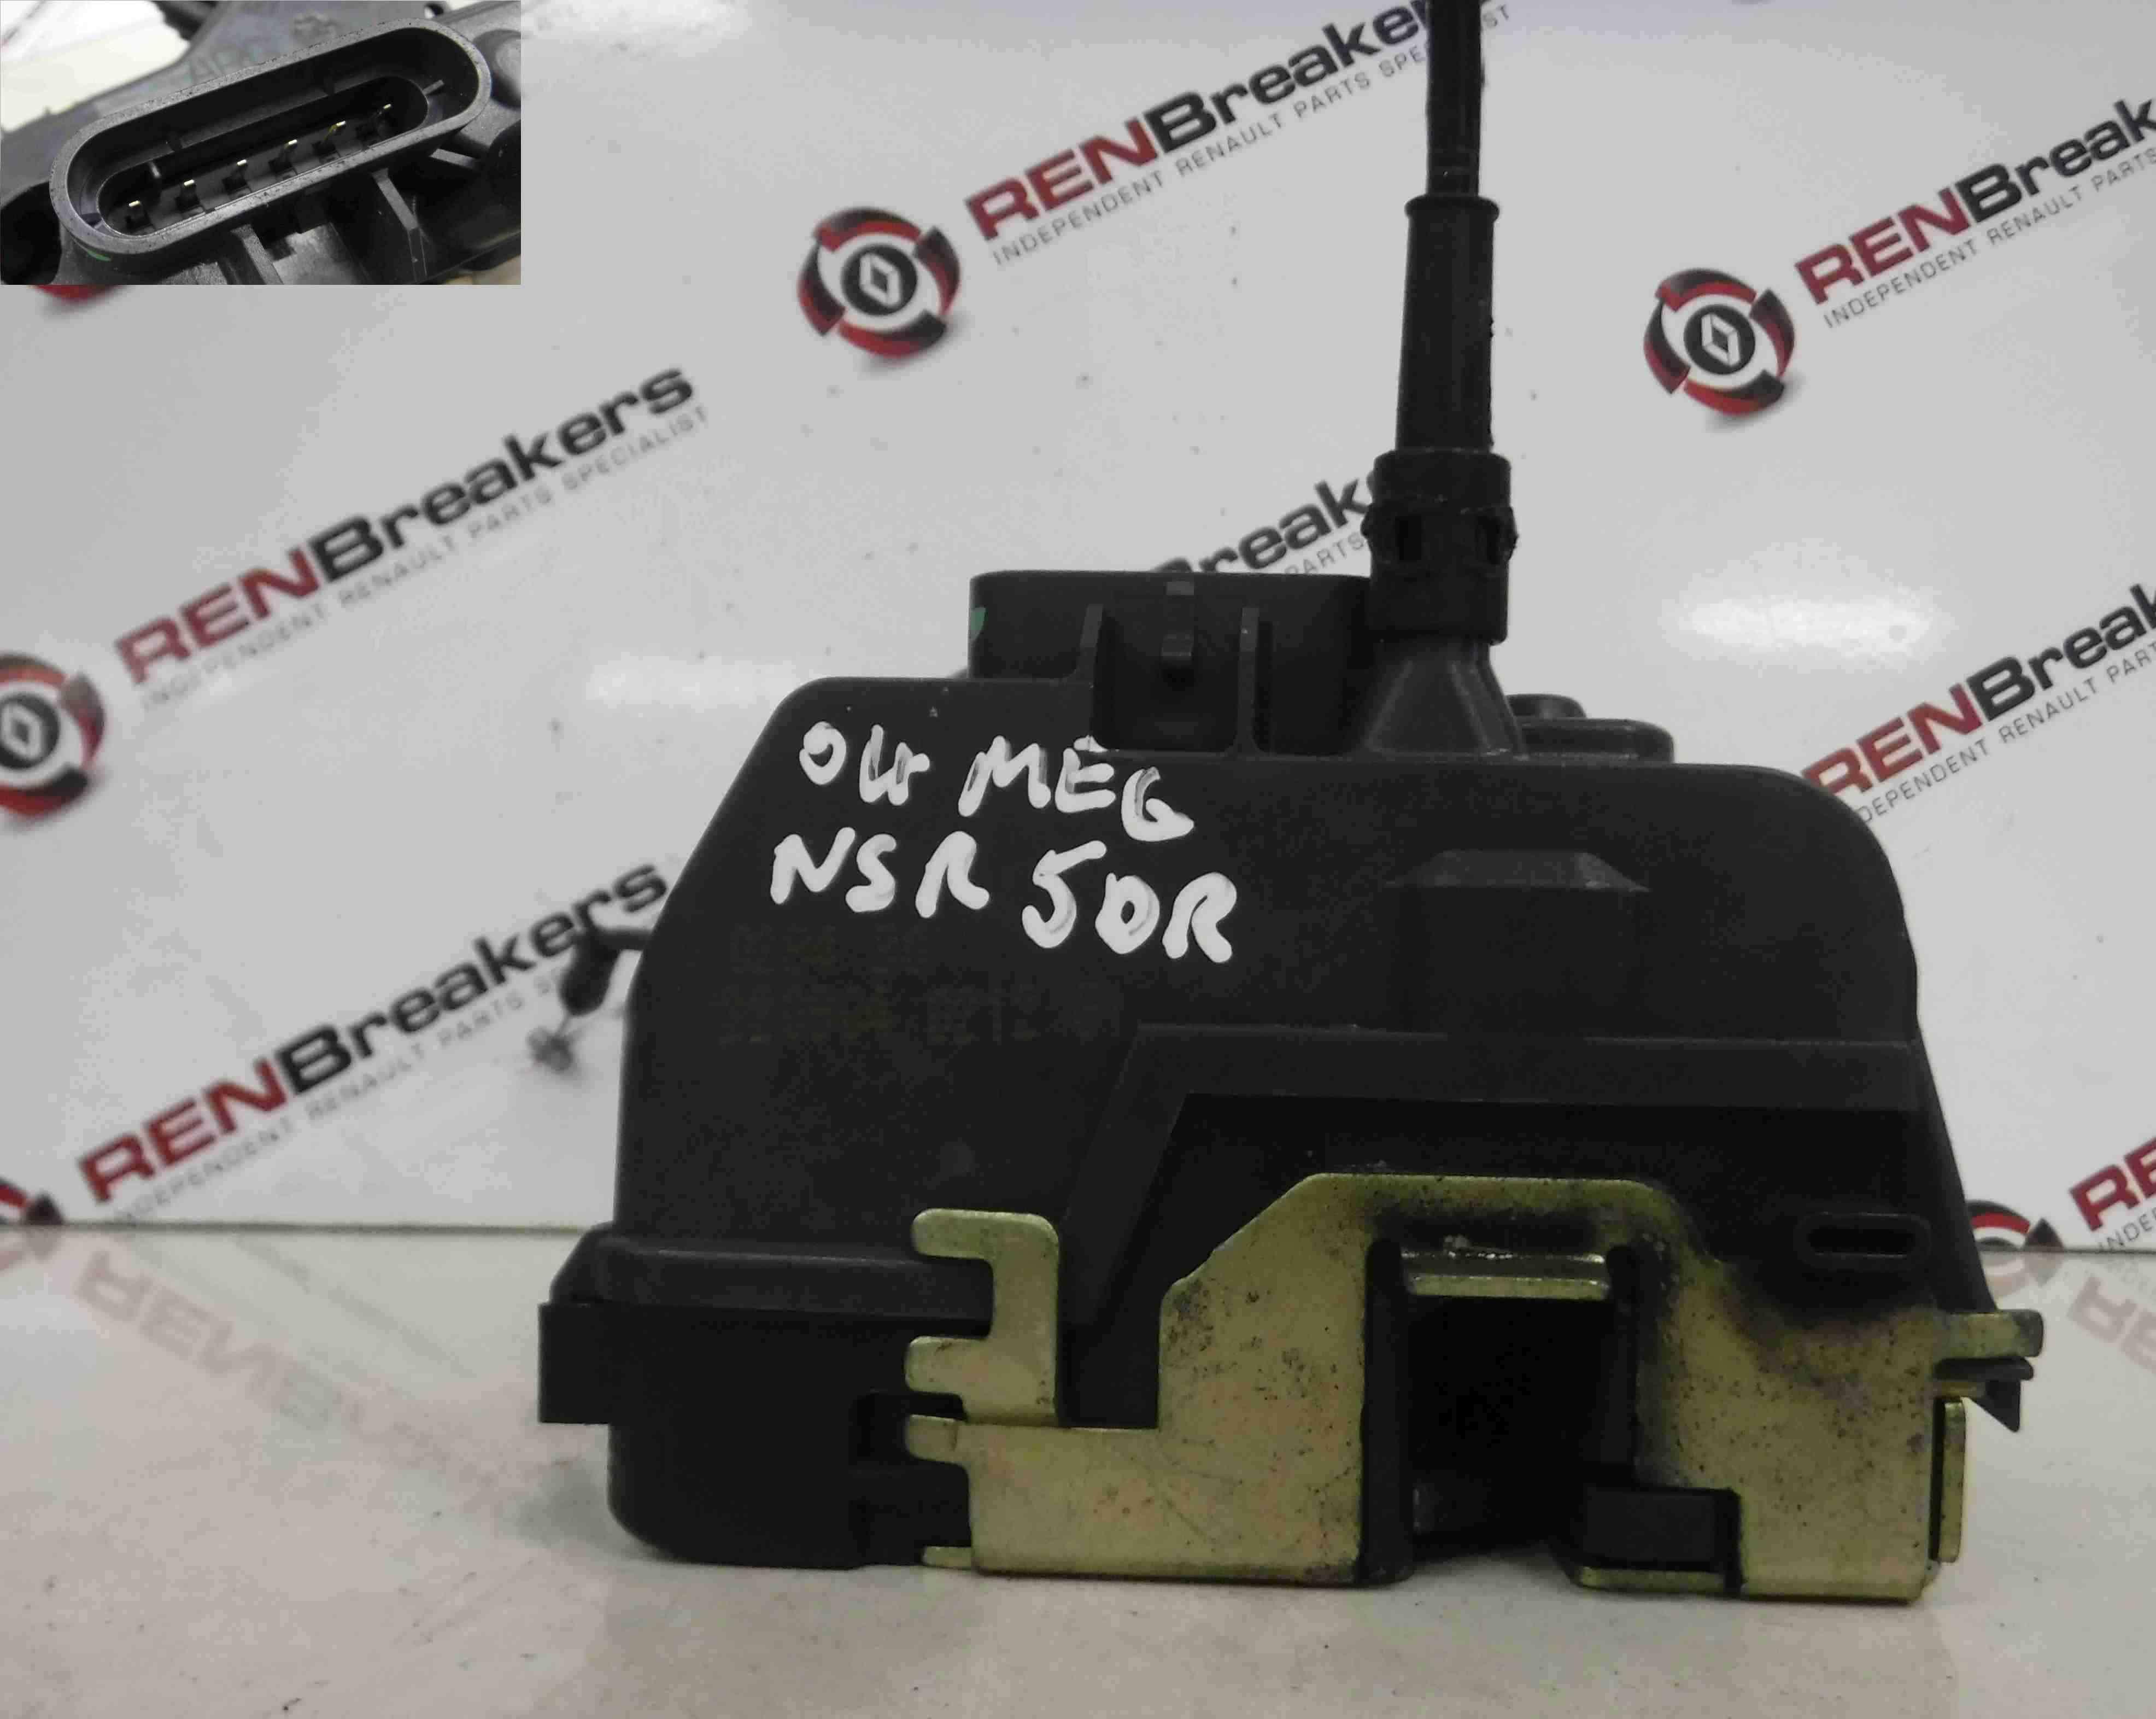 Renault Megane 2002-2008 Passenger NSR Rear Door Lock Mechanism 5dr